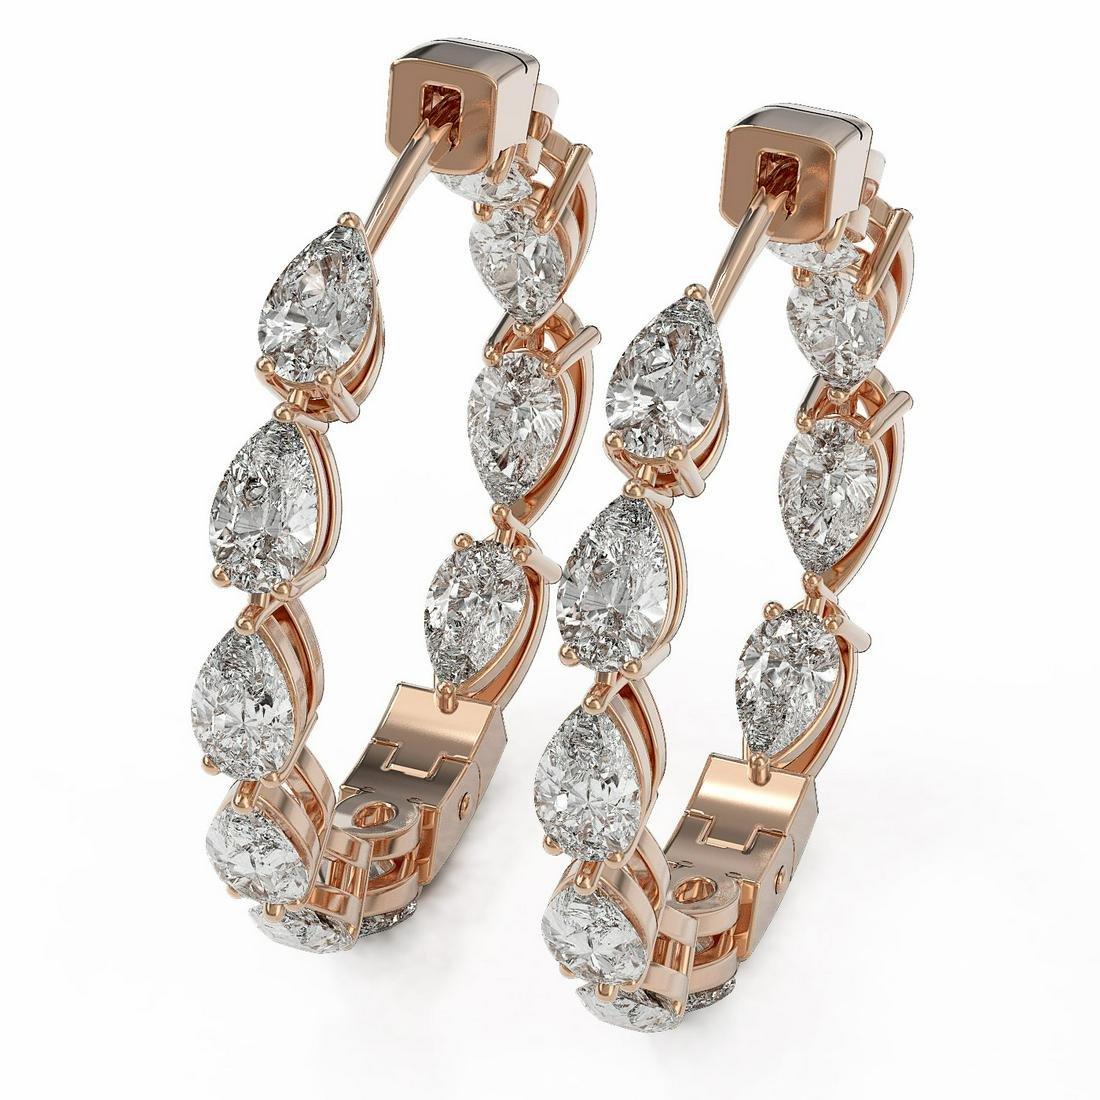 5.2 ctw Pear Cut Diamond Designer Earrings 18K Rose